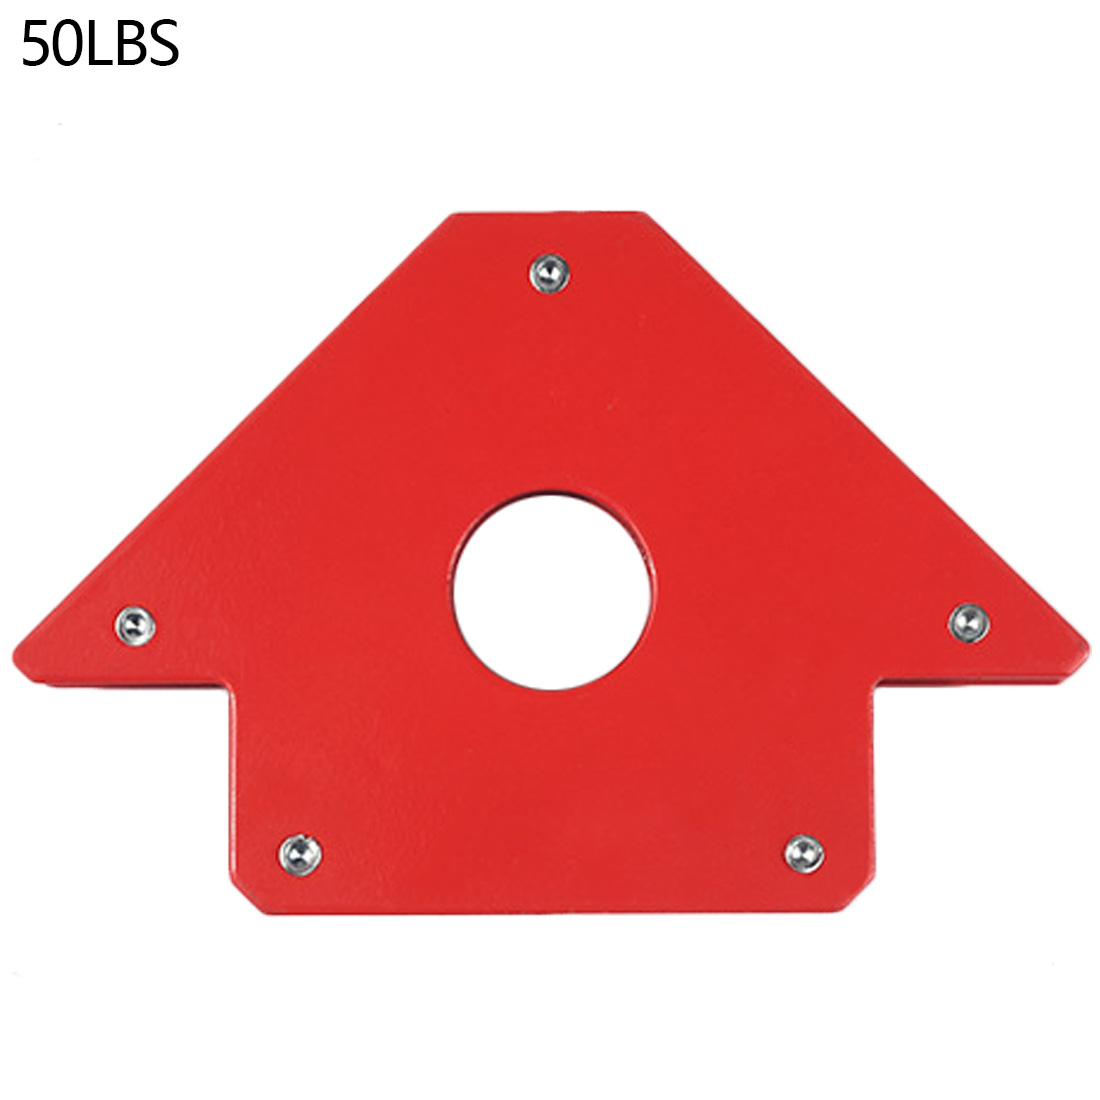 50LB Soldering Locator Strong Magnet Welding Magnetic Holder 3 Angle Arrow Welder Positioner Power Tool Accessories